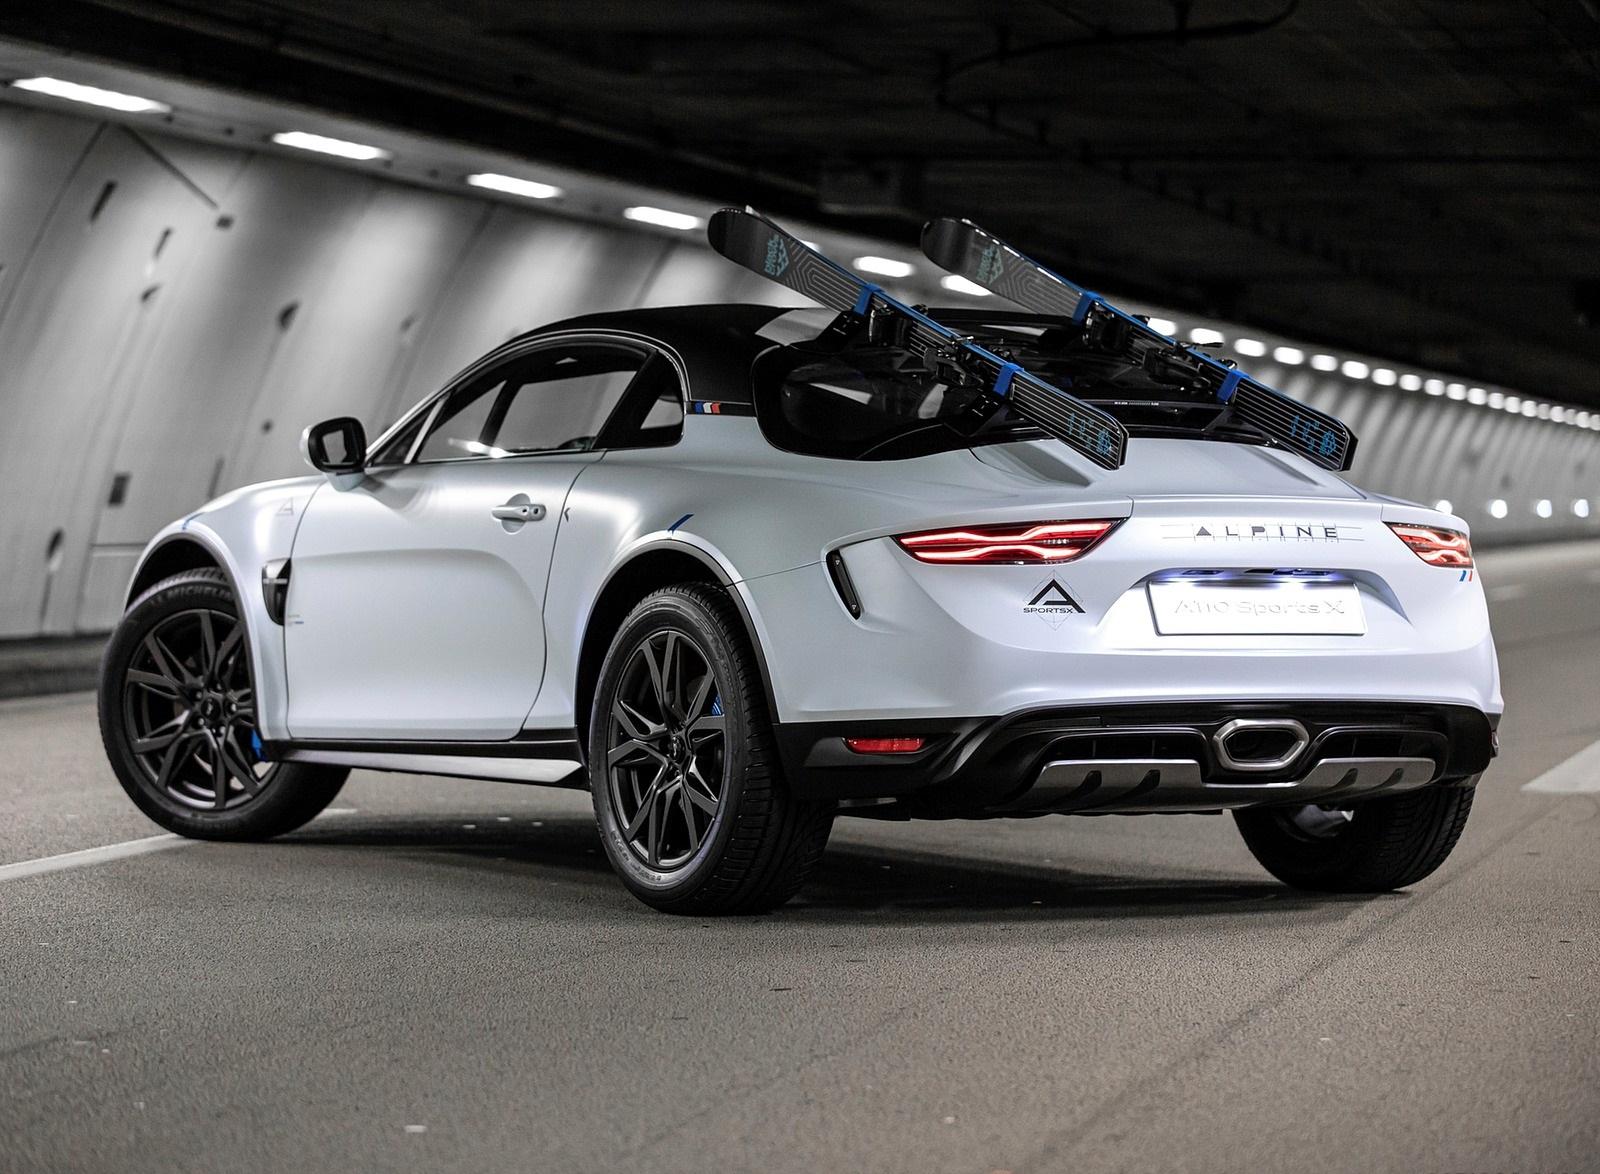 2020 Alpine A110 SportsX Concept Rear Three-Quarter Wallpapers (6)